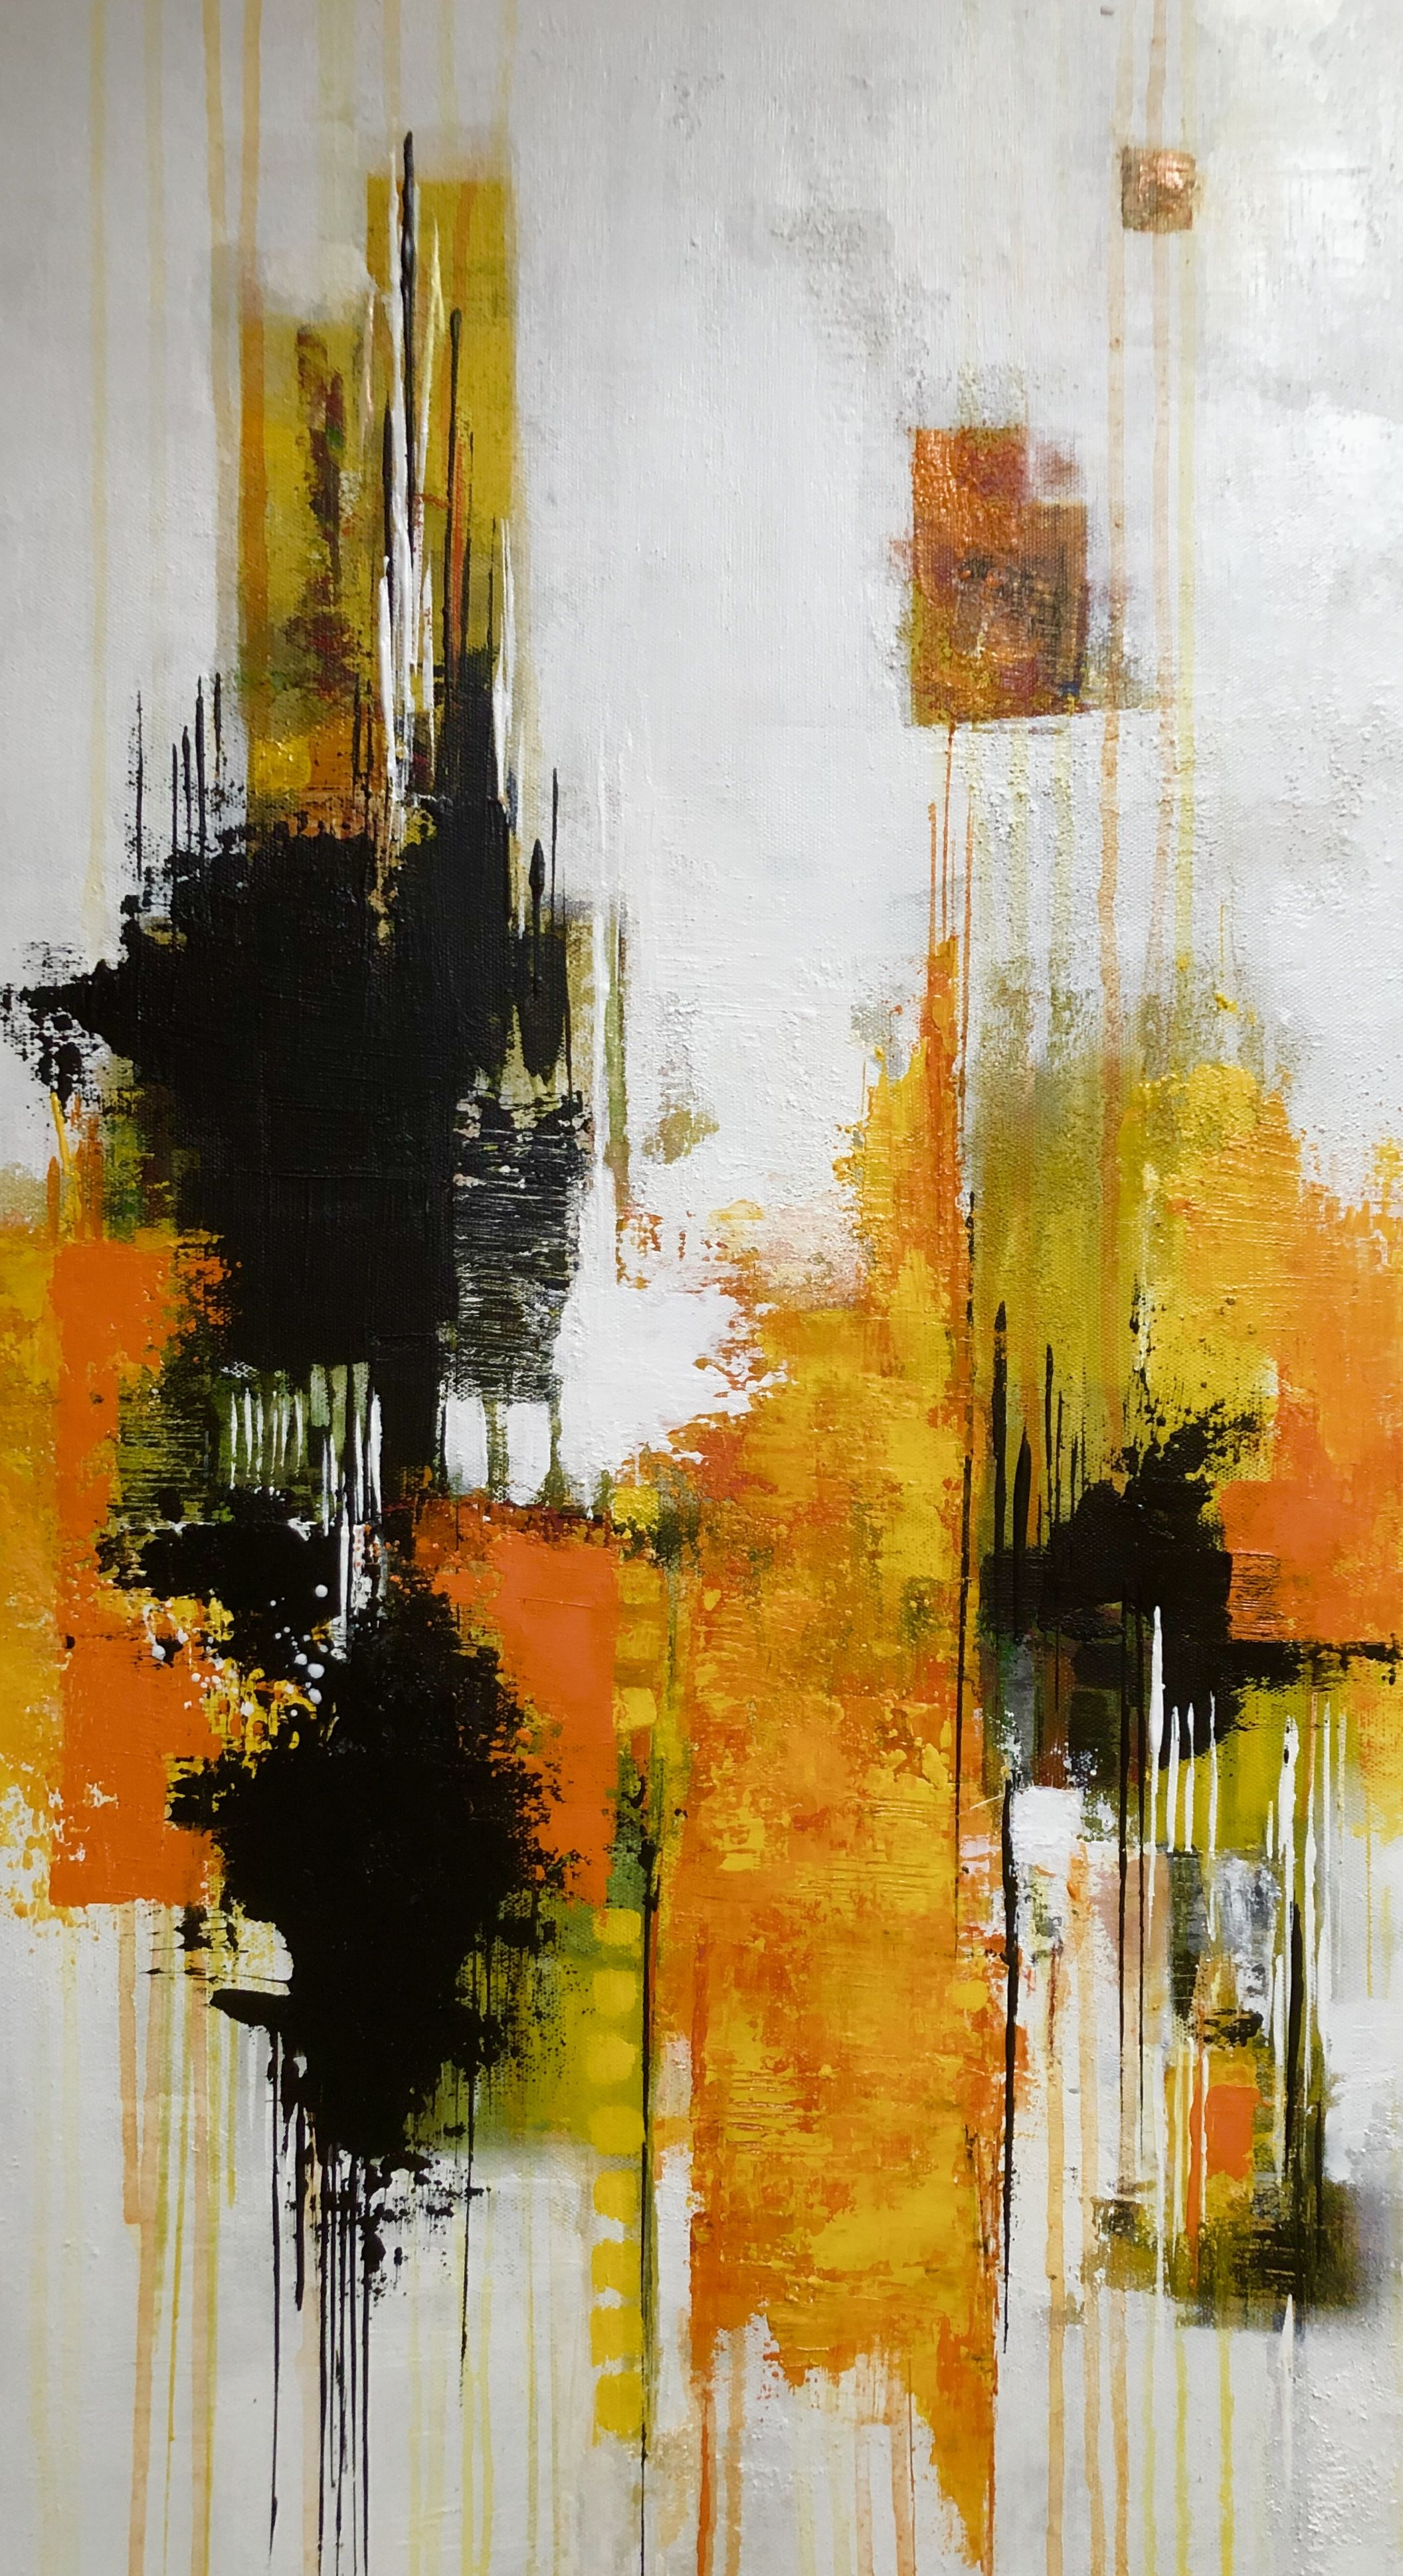 Abstraktes Bild In Acryl Sonnengelb 80x40 Cm Acrylbilder Abstrakt Abstrakte Kunst Gemalde Abstrakte Malerei